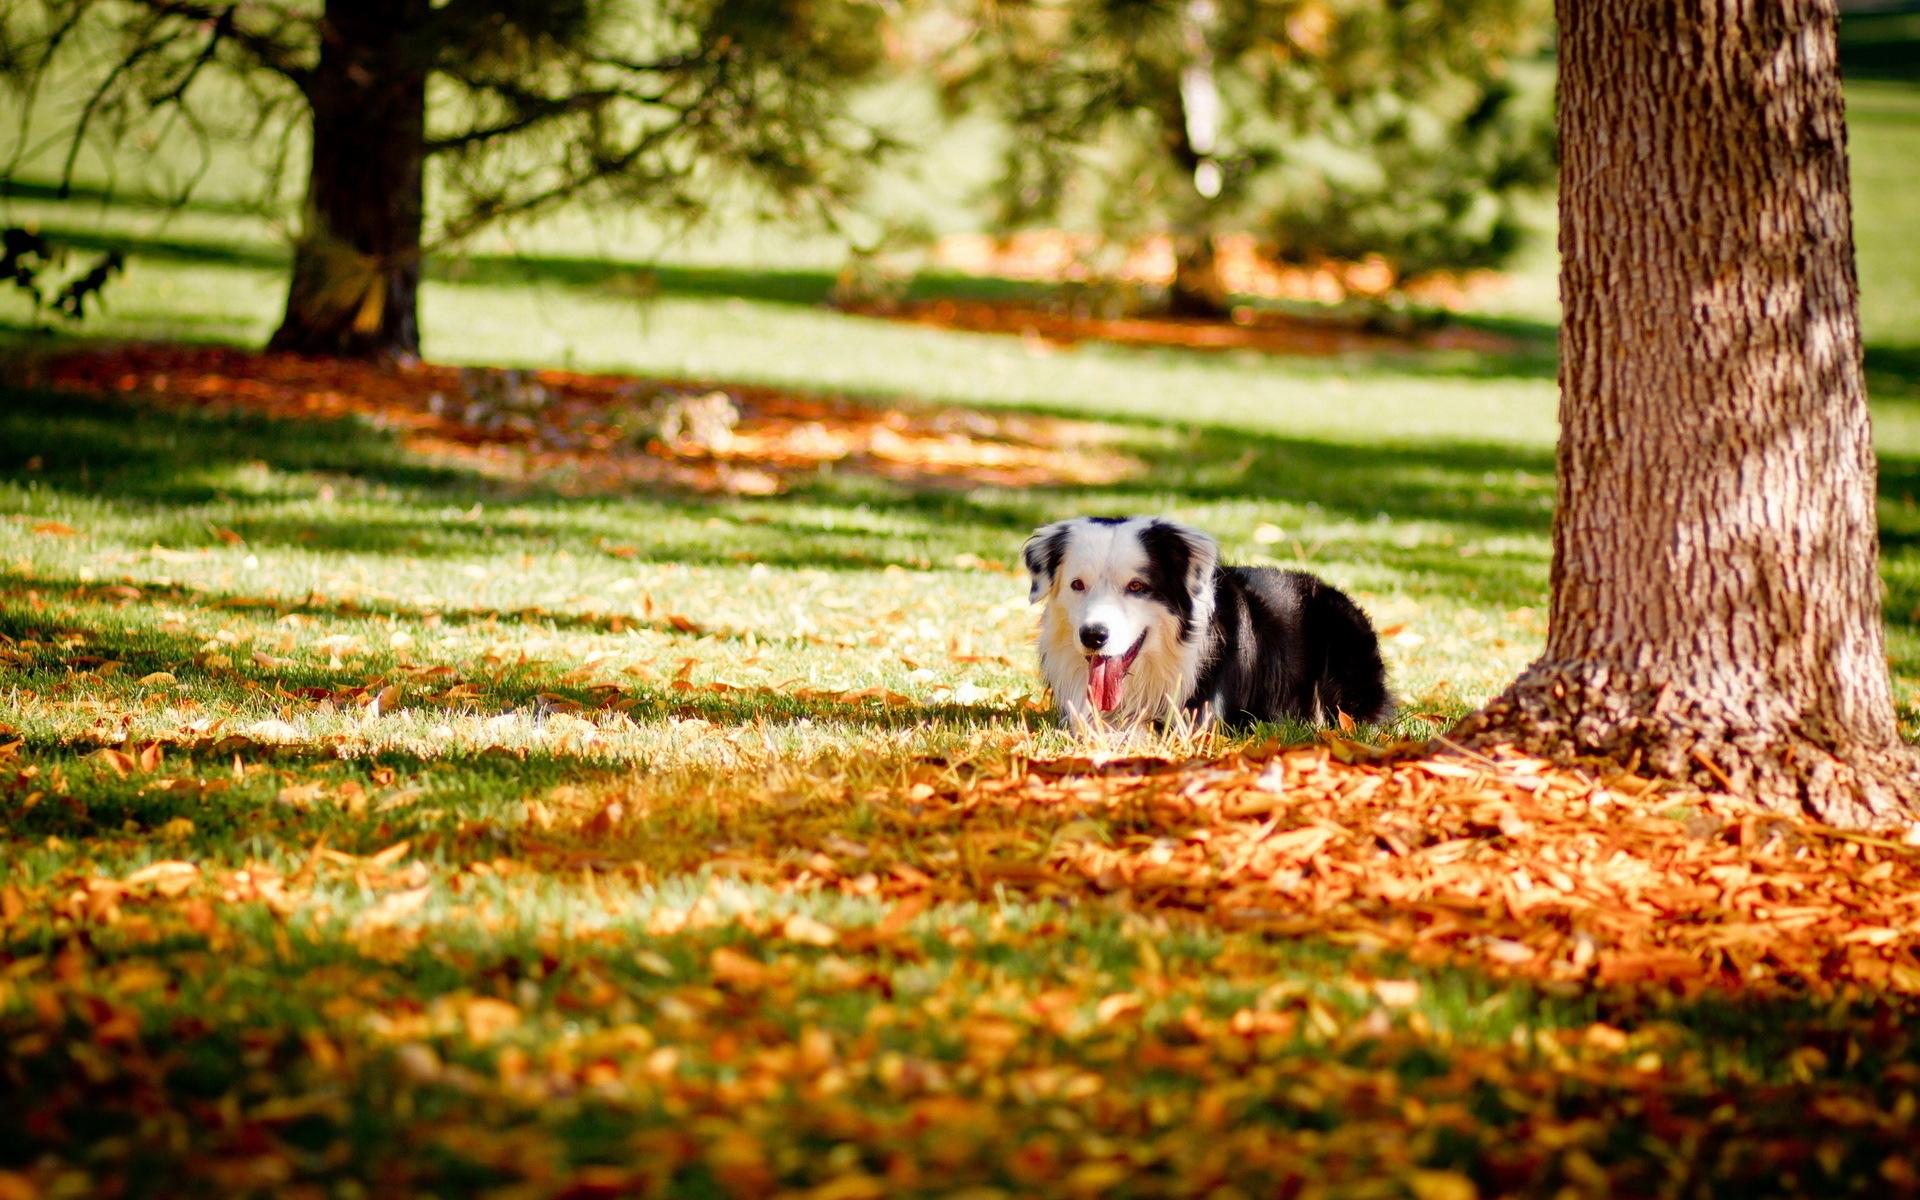 Autumn Dog Wallpaper Autumn is my favourite 1920x1200